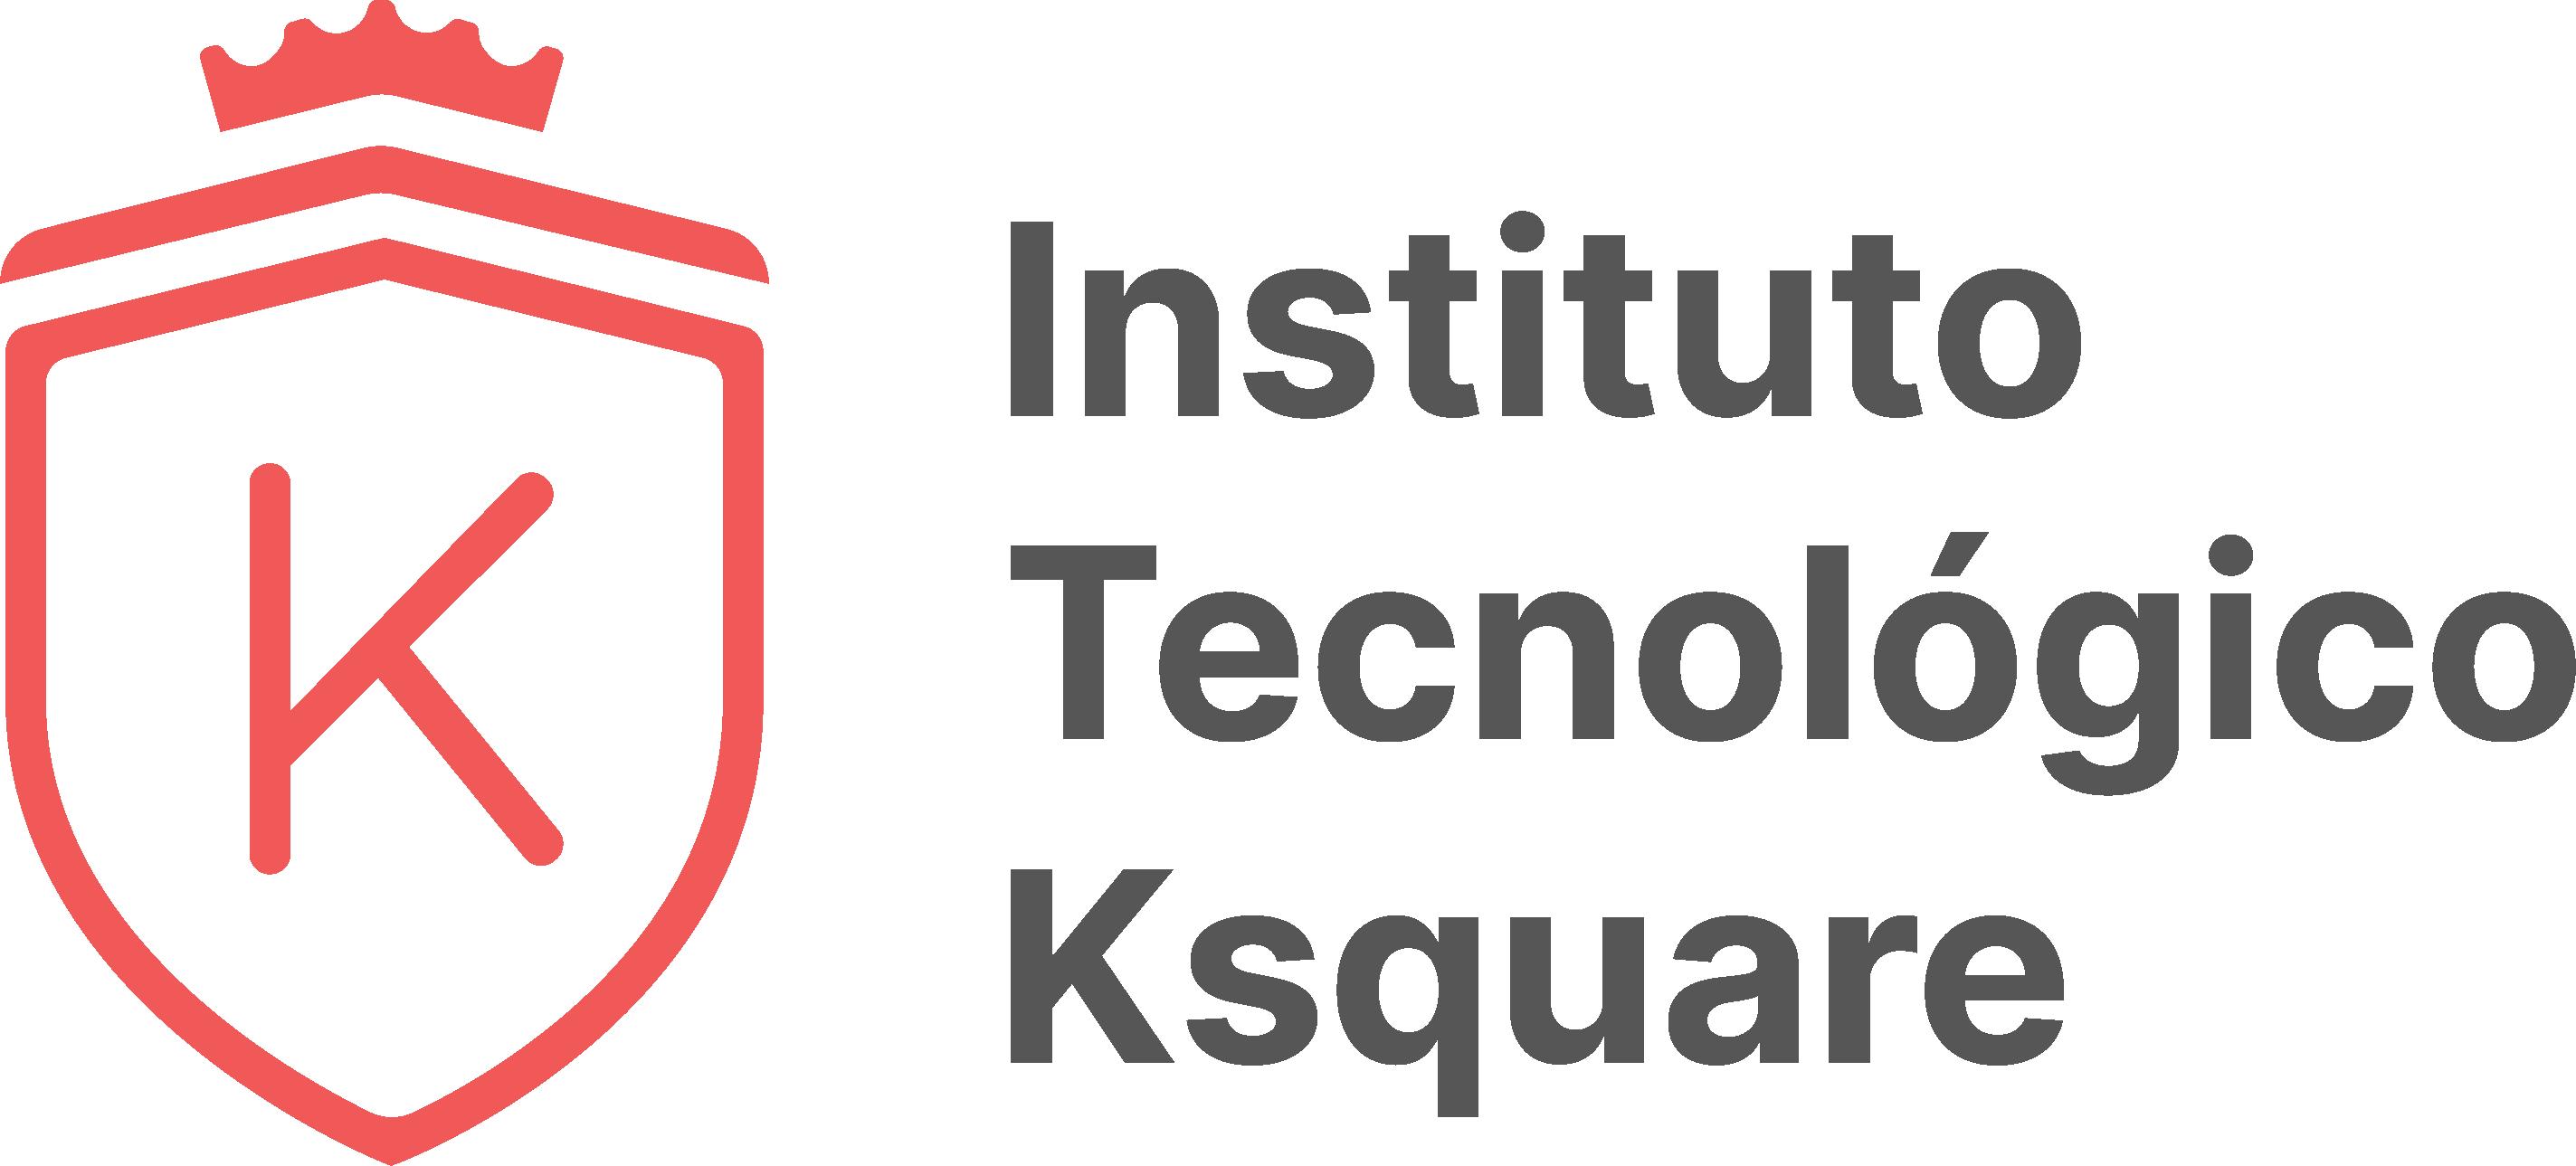 Instituto Tecnológico Ksquare